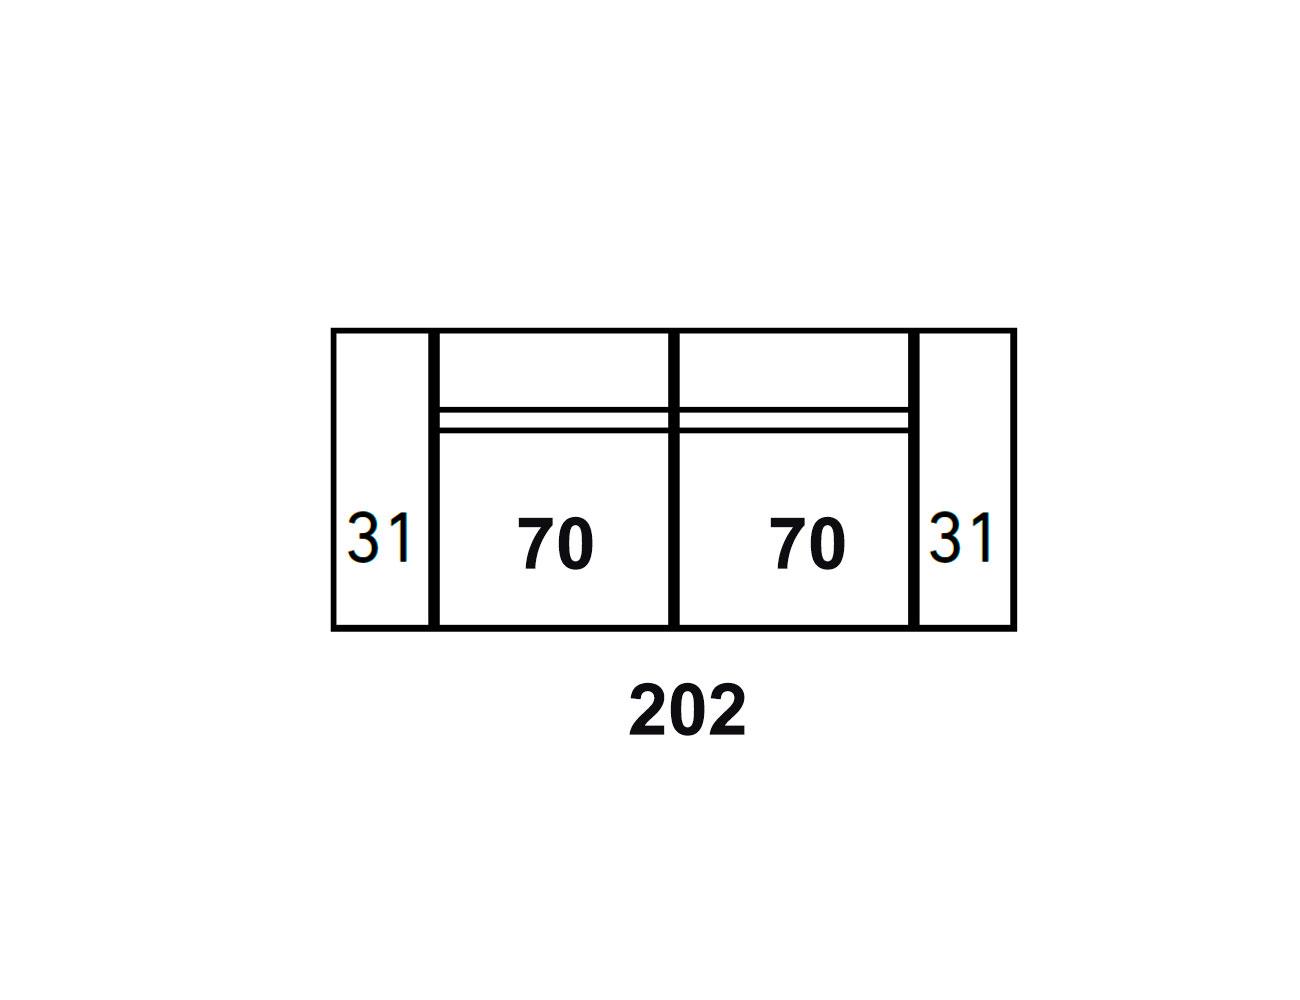 Croquis 202